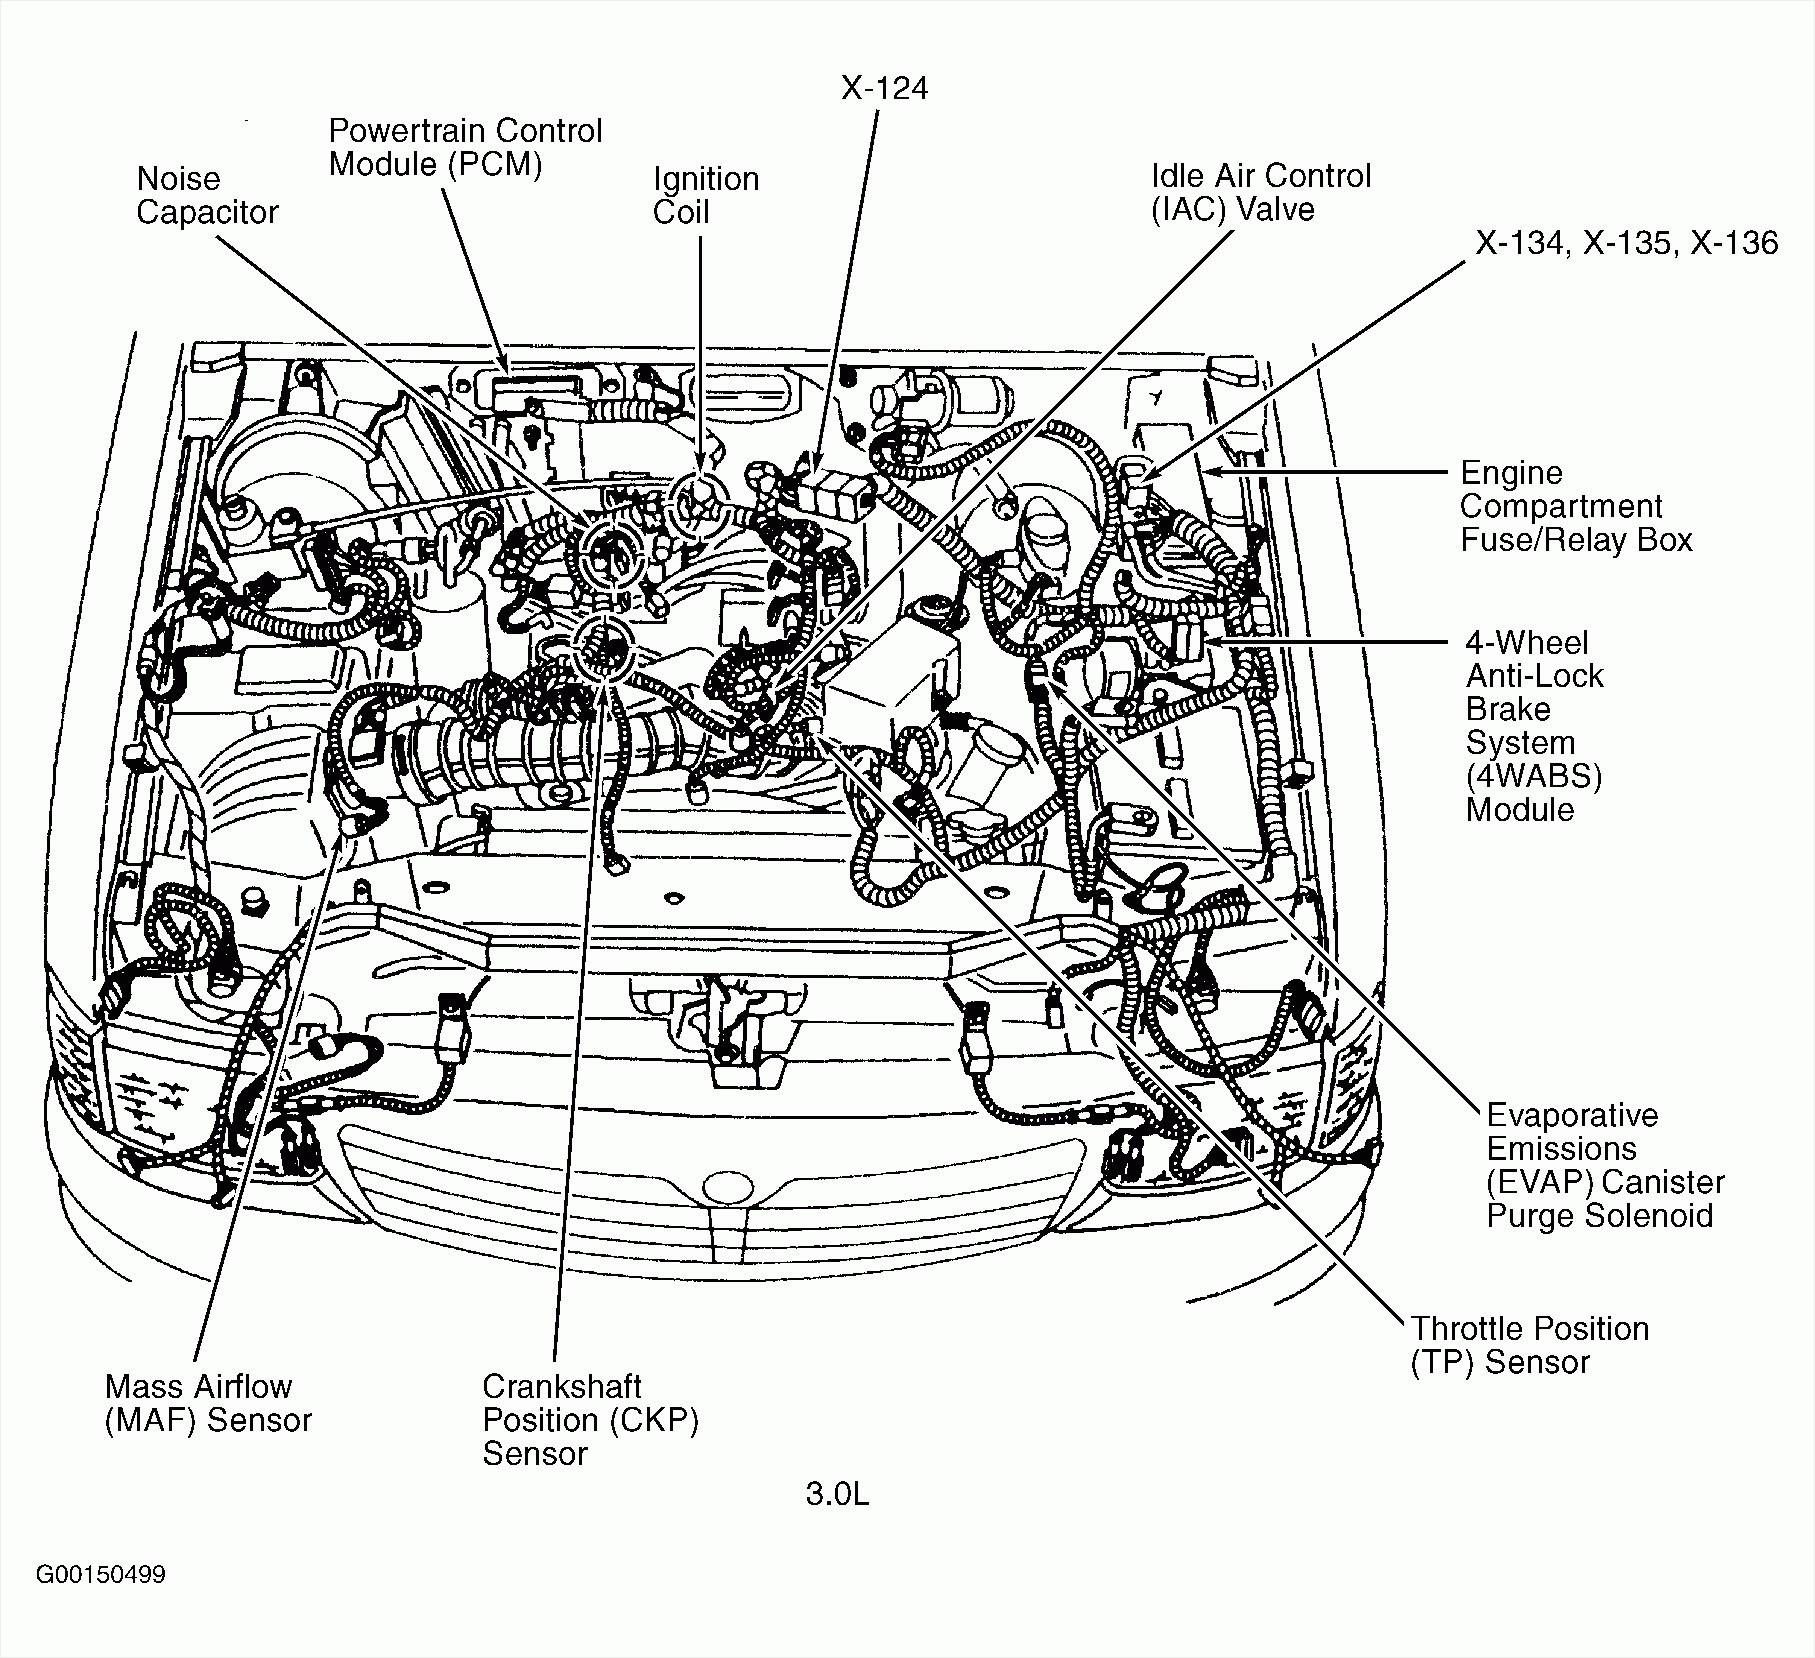 2001 Dodge Caravan Engine Diagram 97 Rav4 Engine Diagram Of 2001 Dodge Caravan Engine Diagram